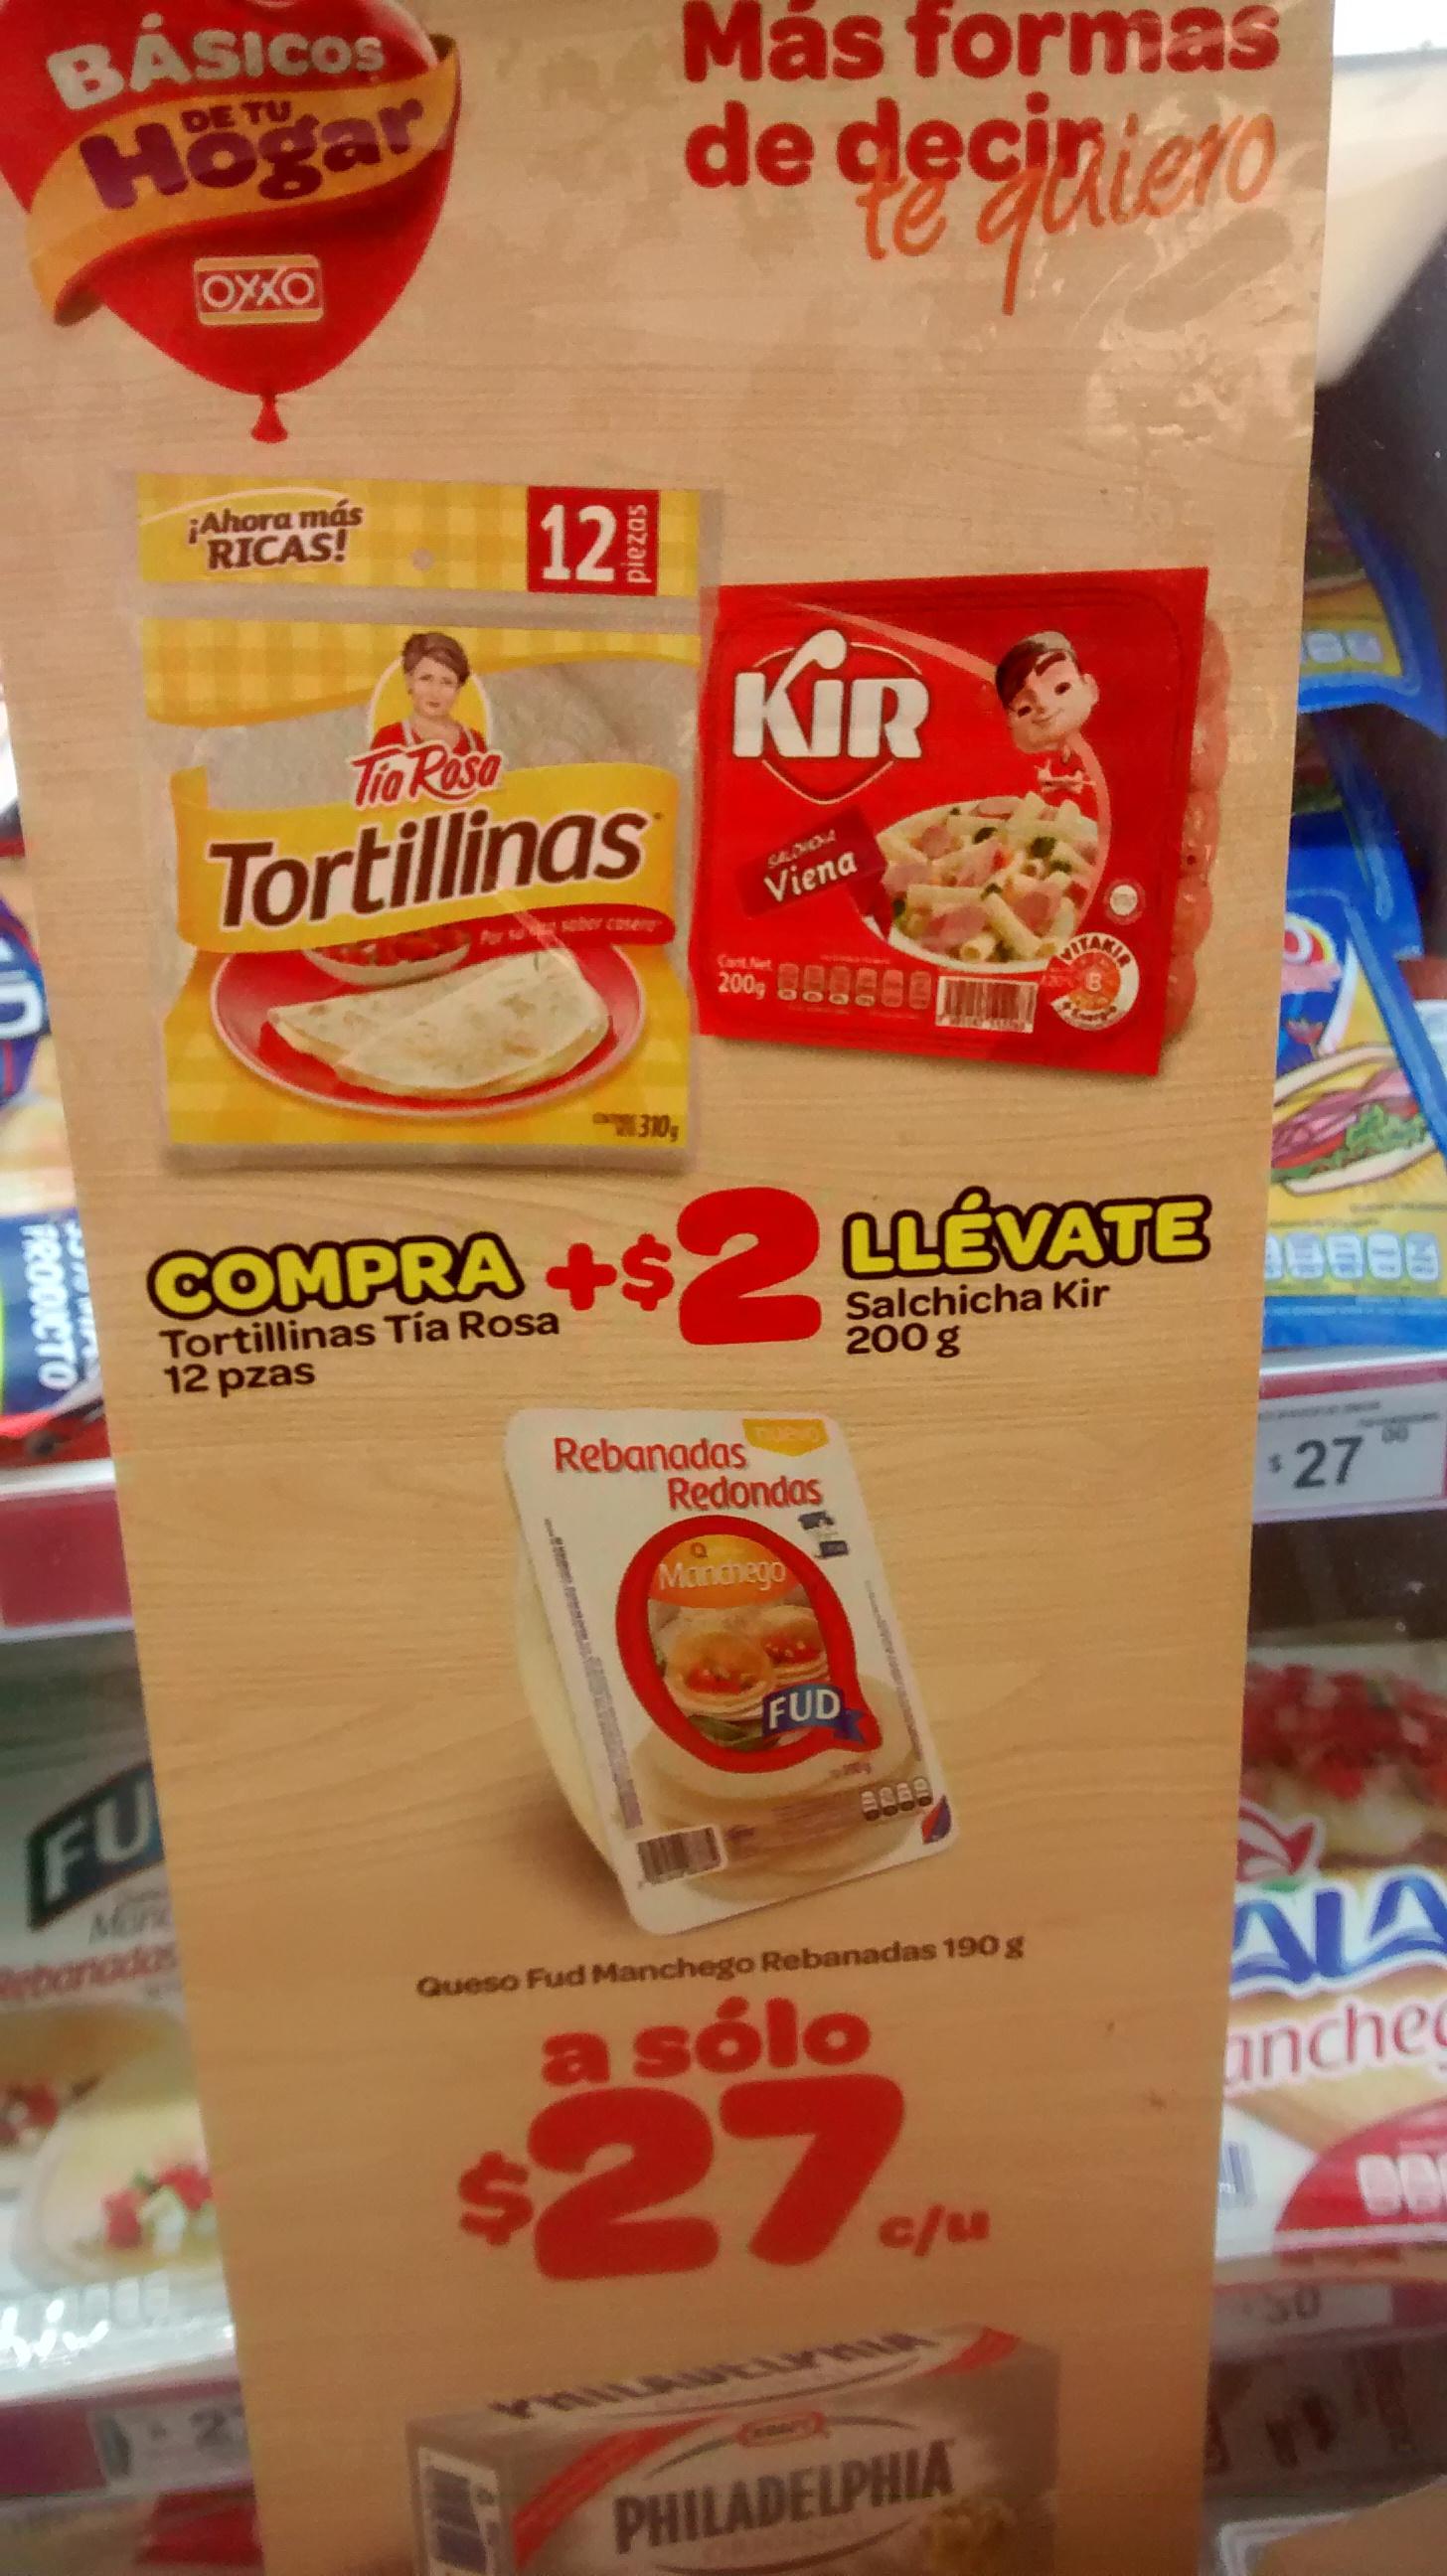 Oxxo: compra Tortillinas tía rosa + $2 salchichas kir 200g